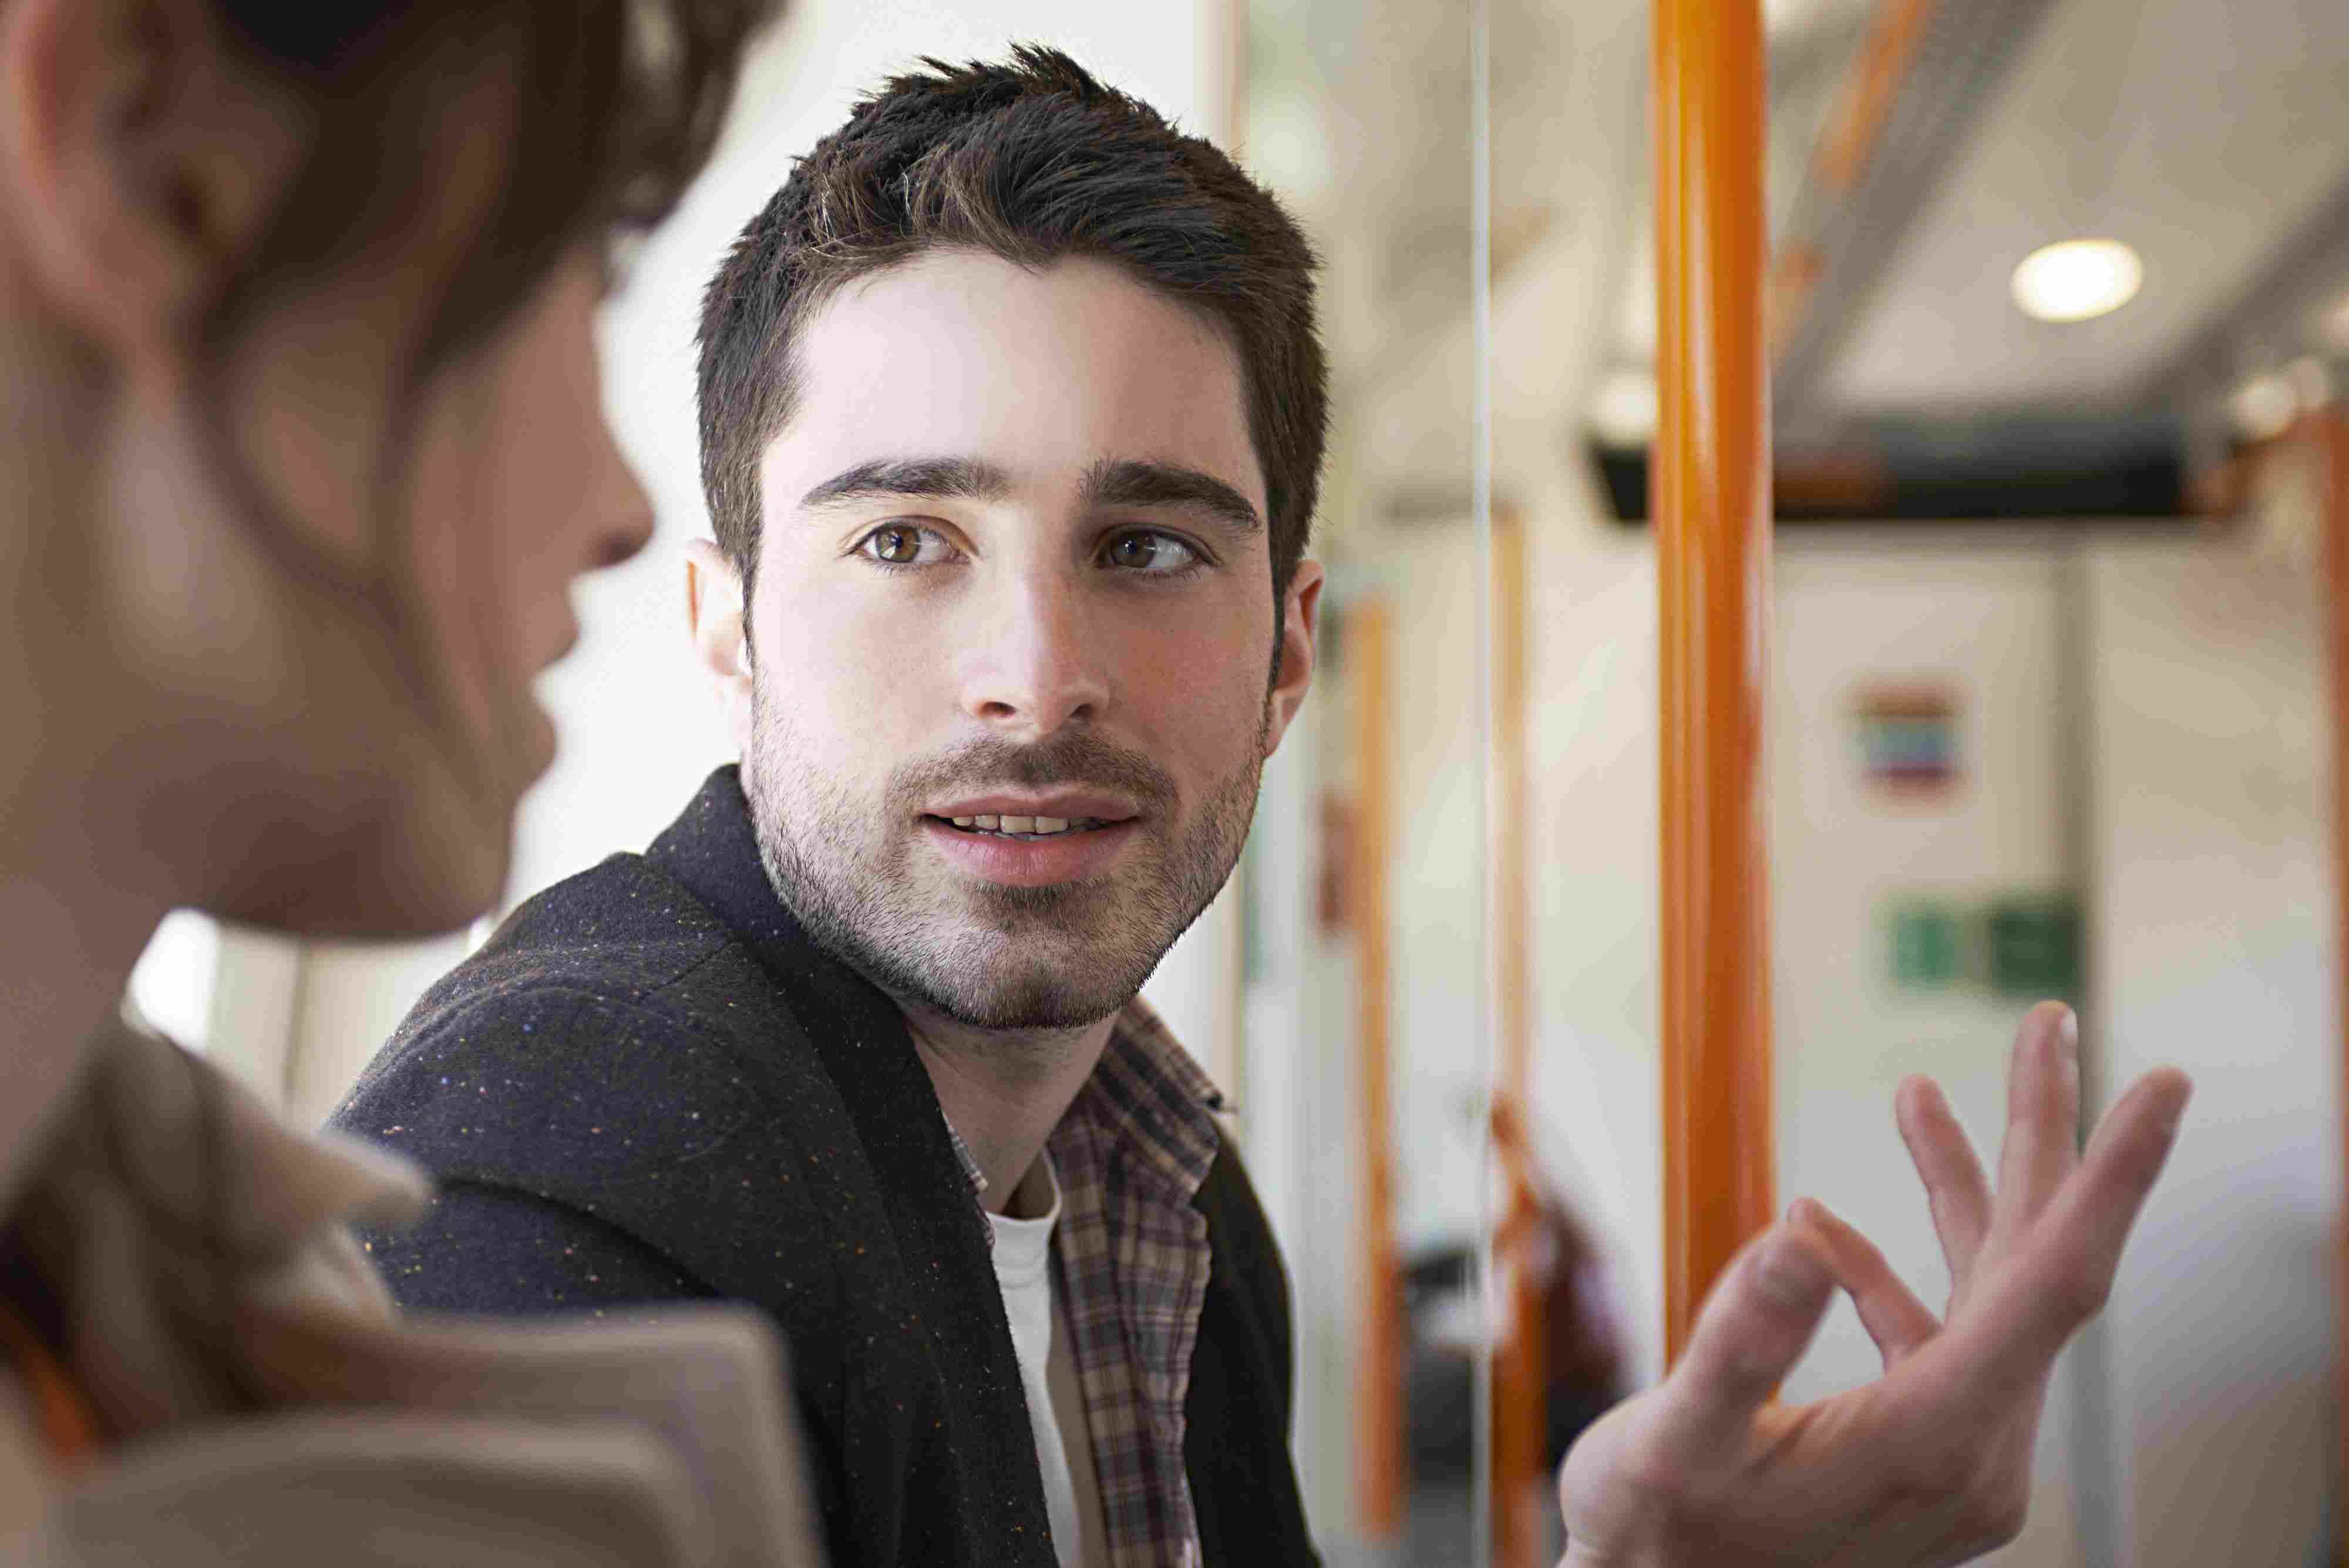 Man and woman talking on subway